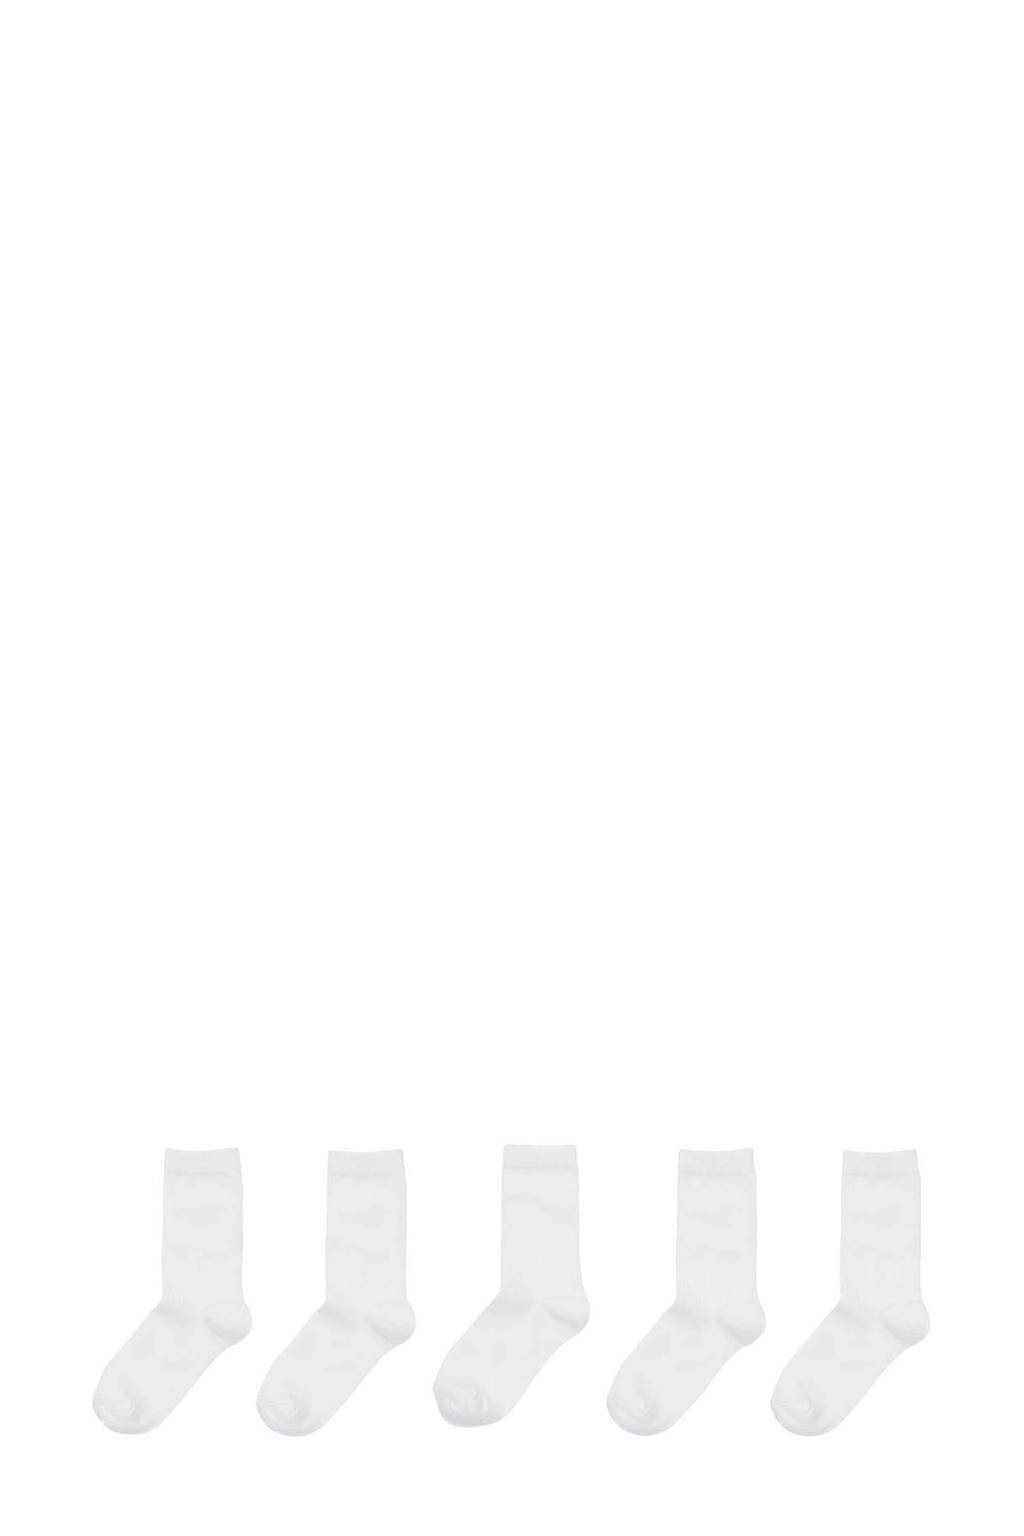 HEMA 5-pak kindersokken wit, Wit